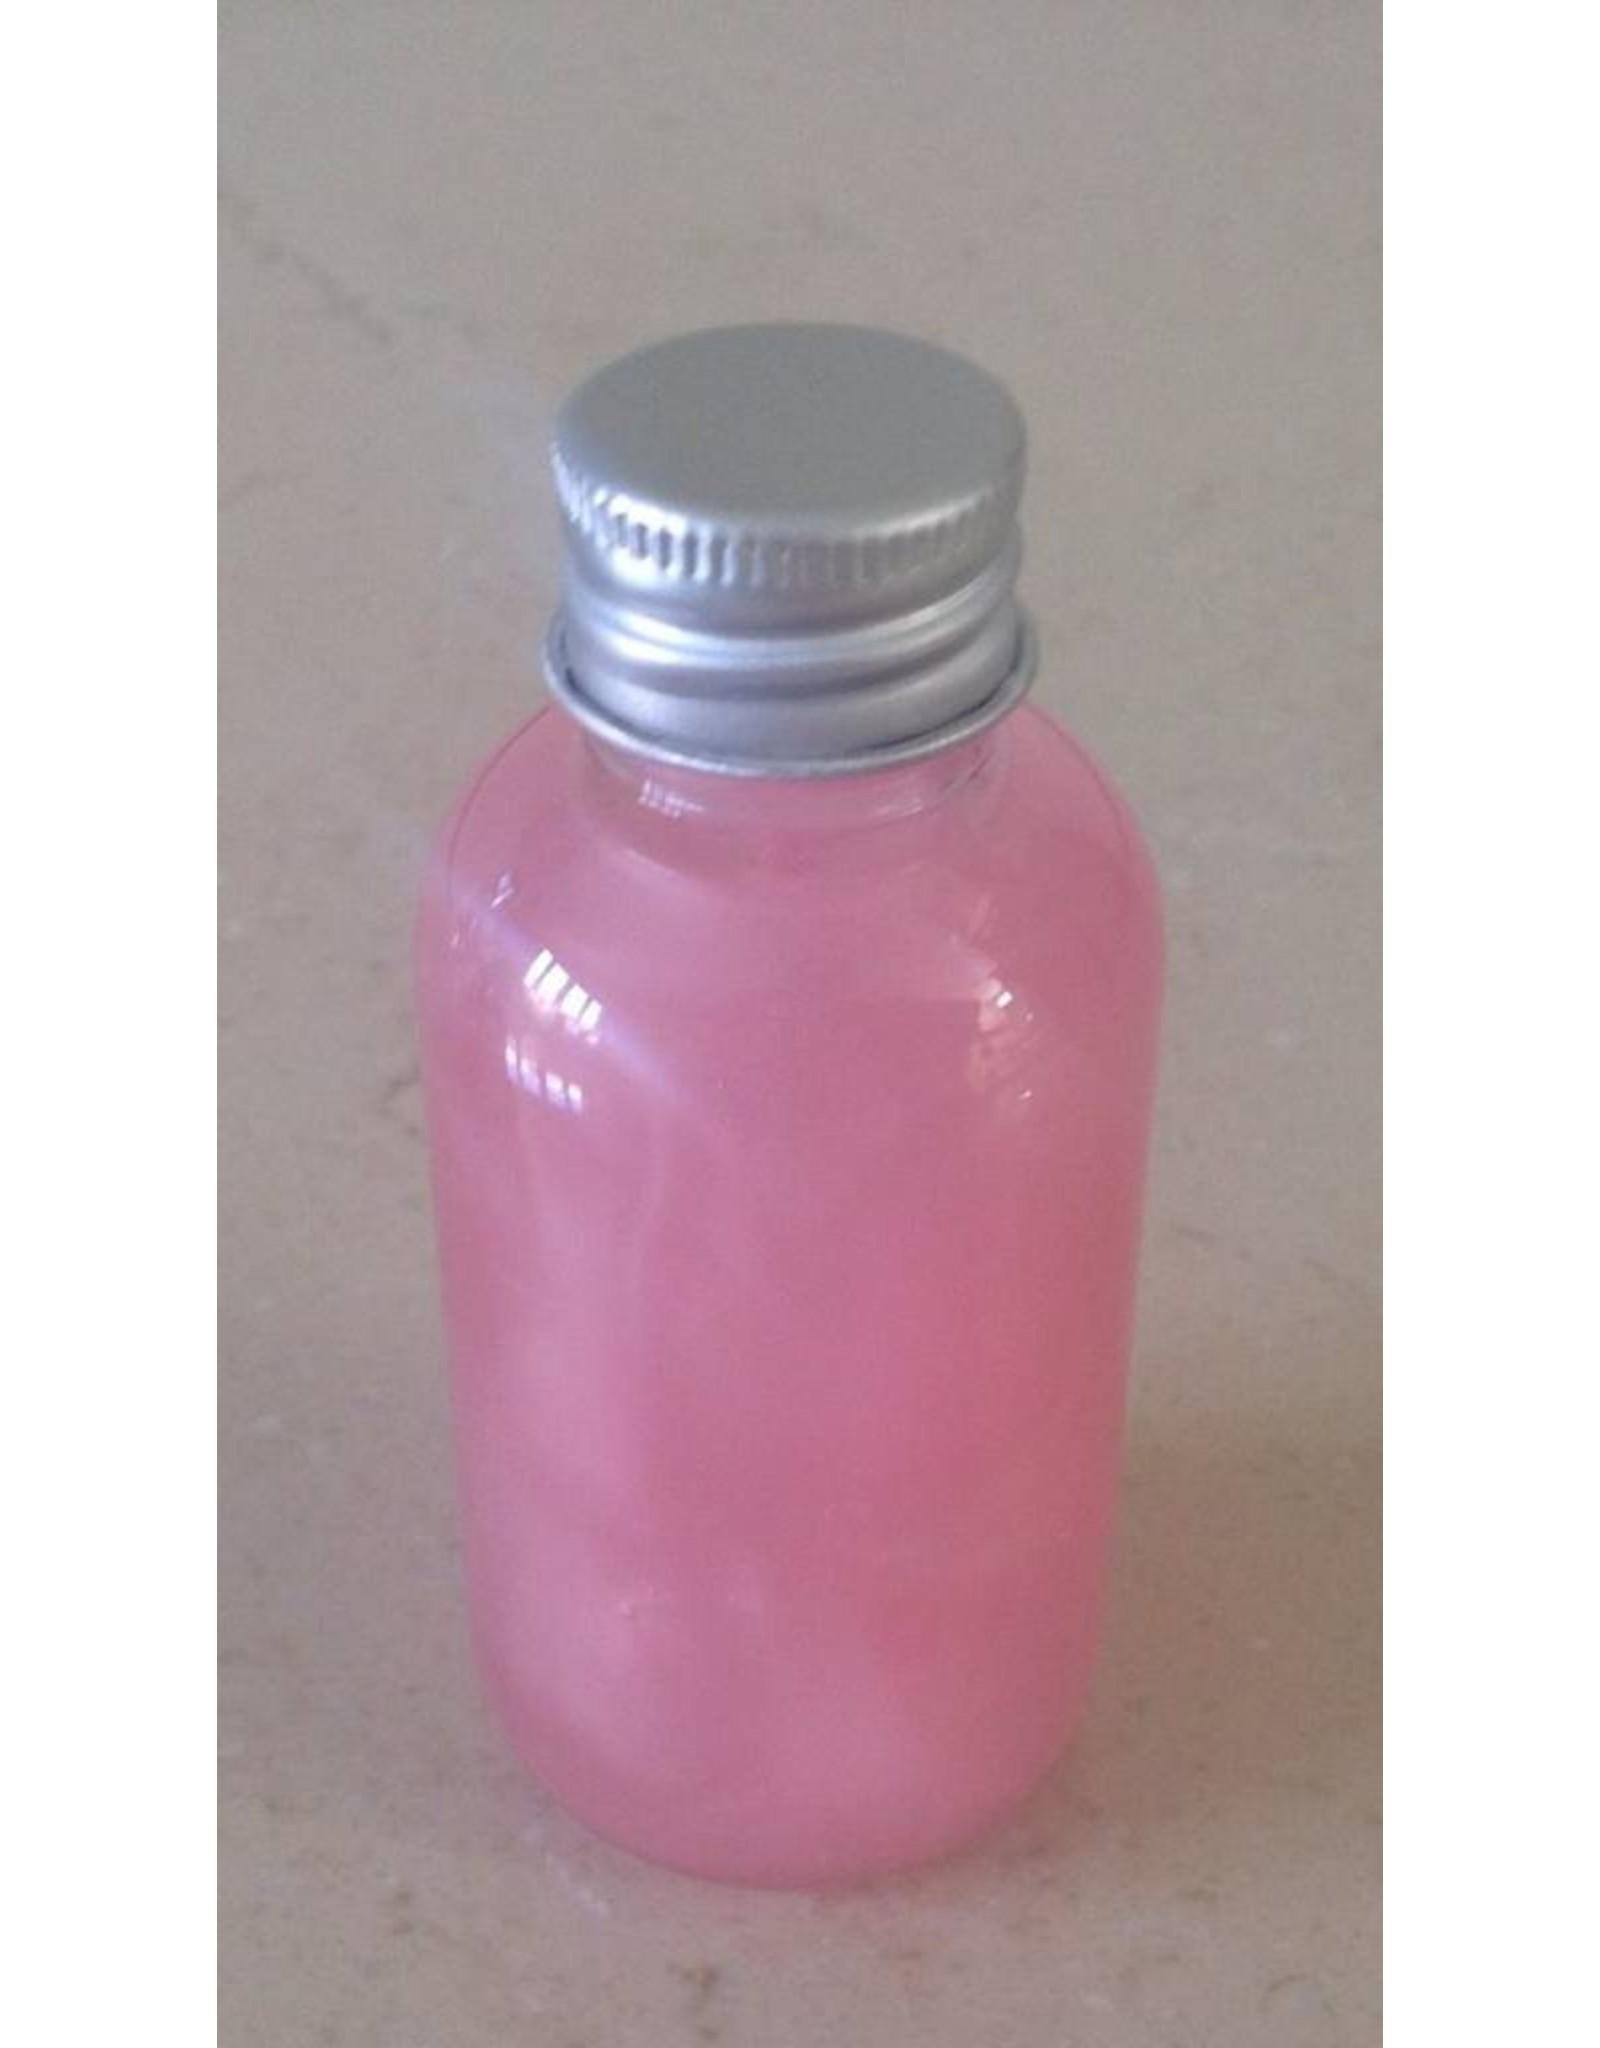 Bad- douchegel 'Rozen' 50 ml - Body & Soap